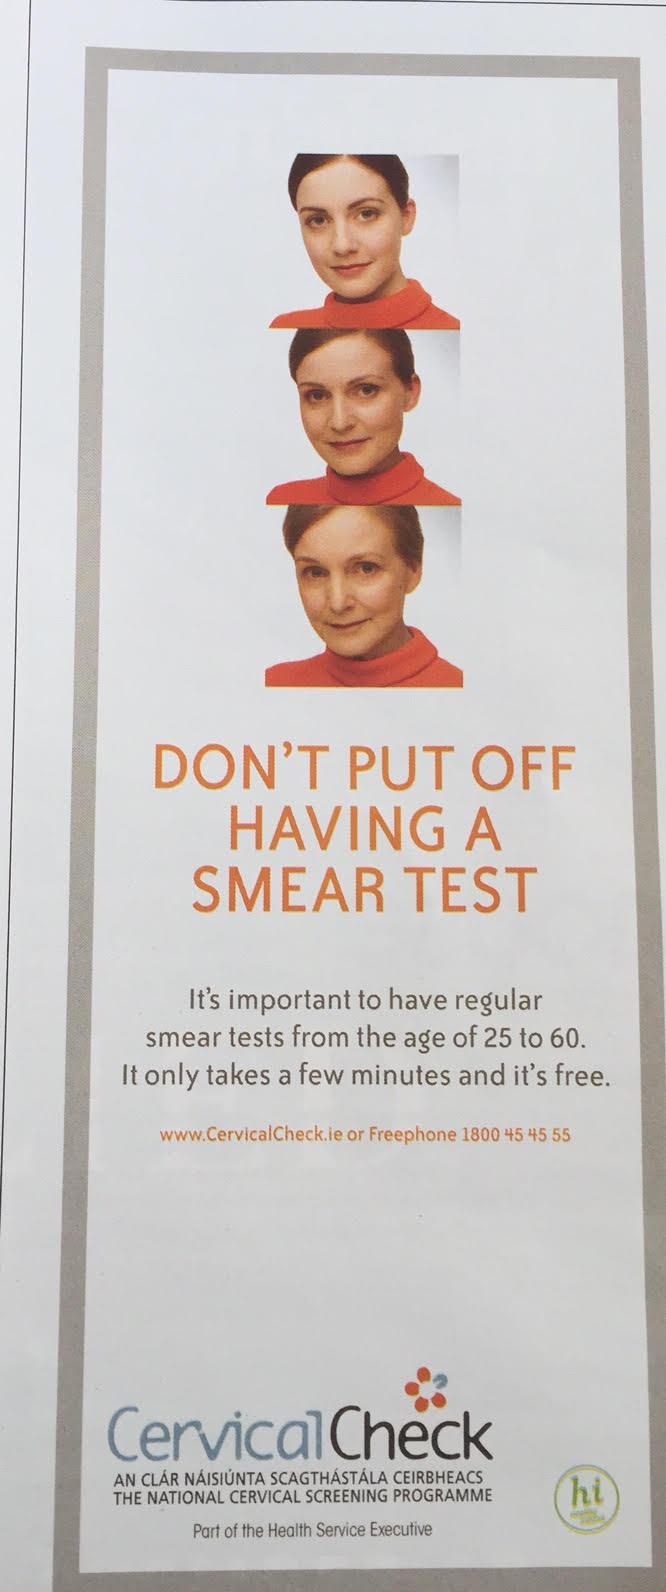 CervicalCheck – Don't put off having a smear test